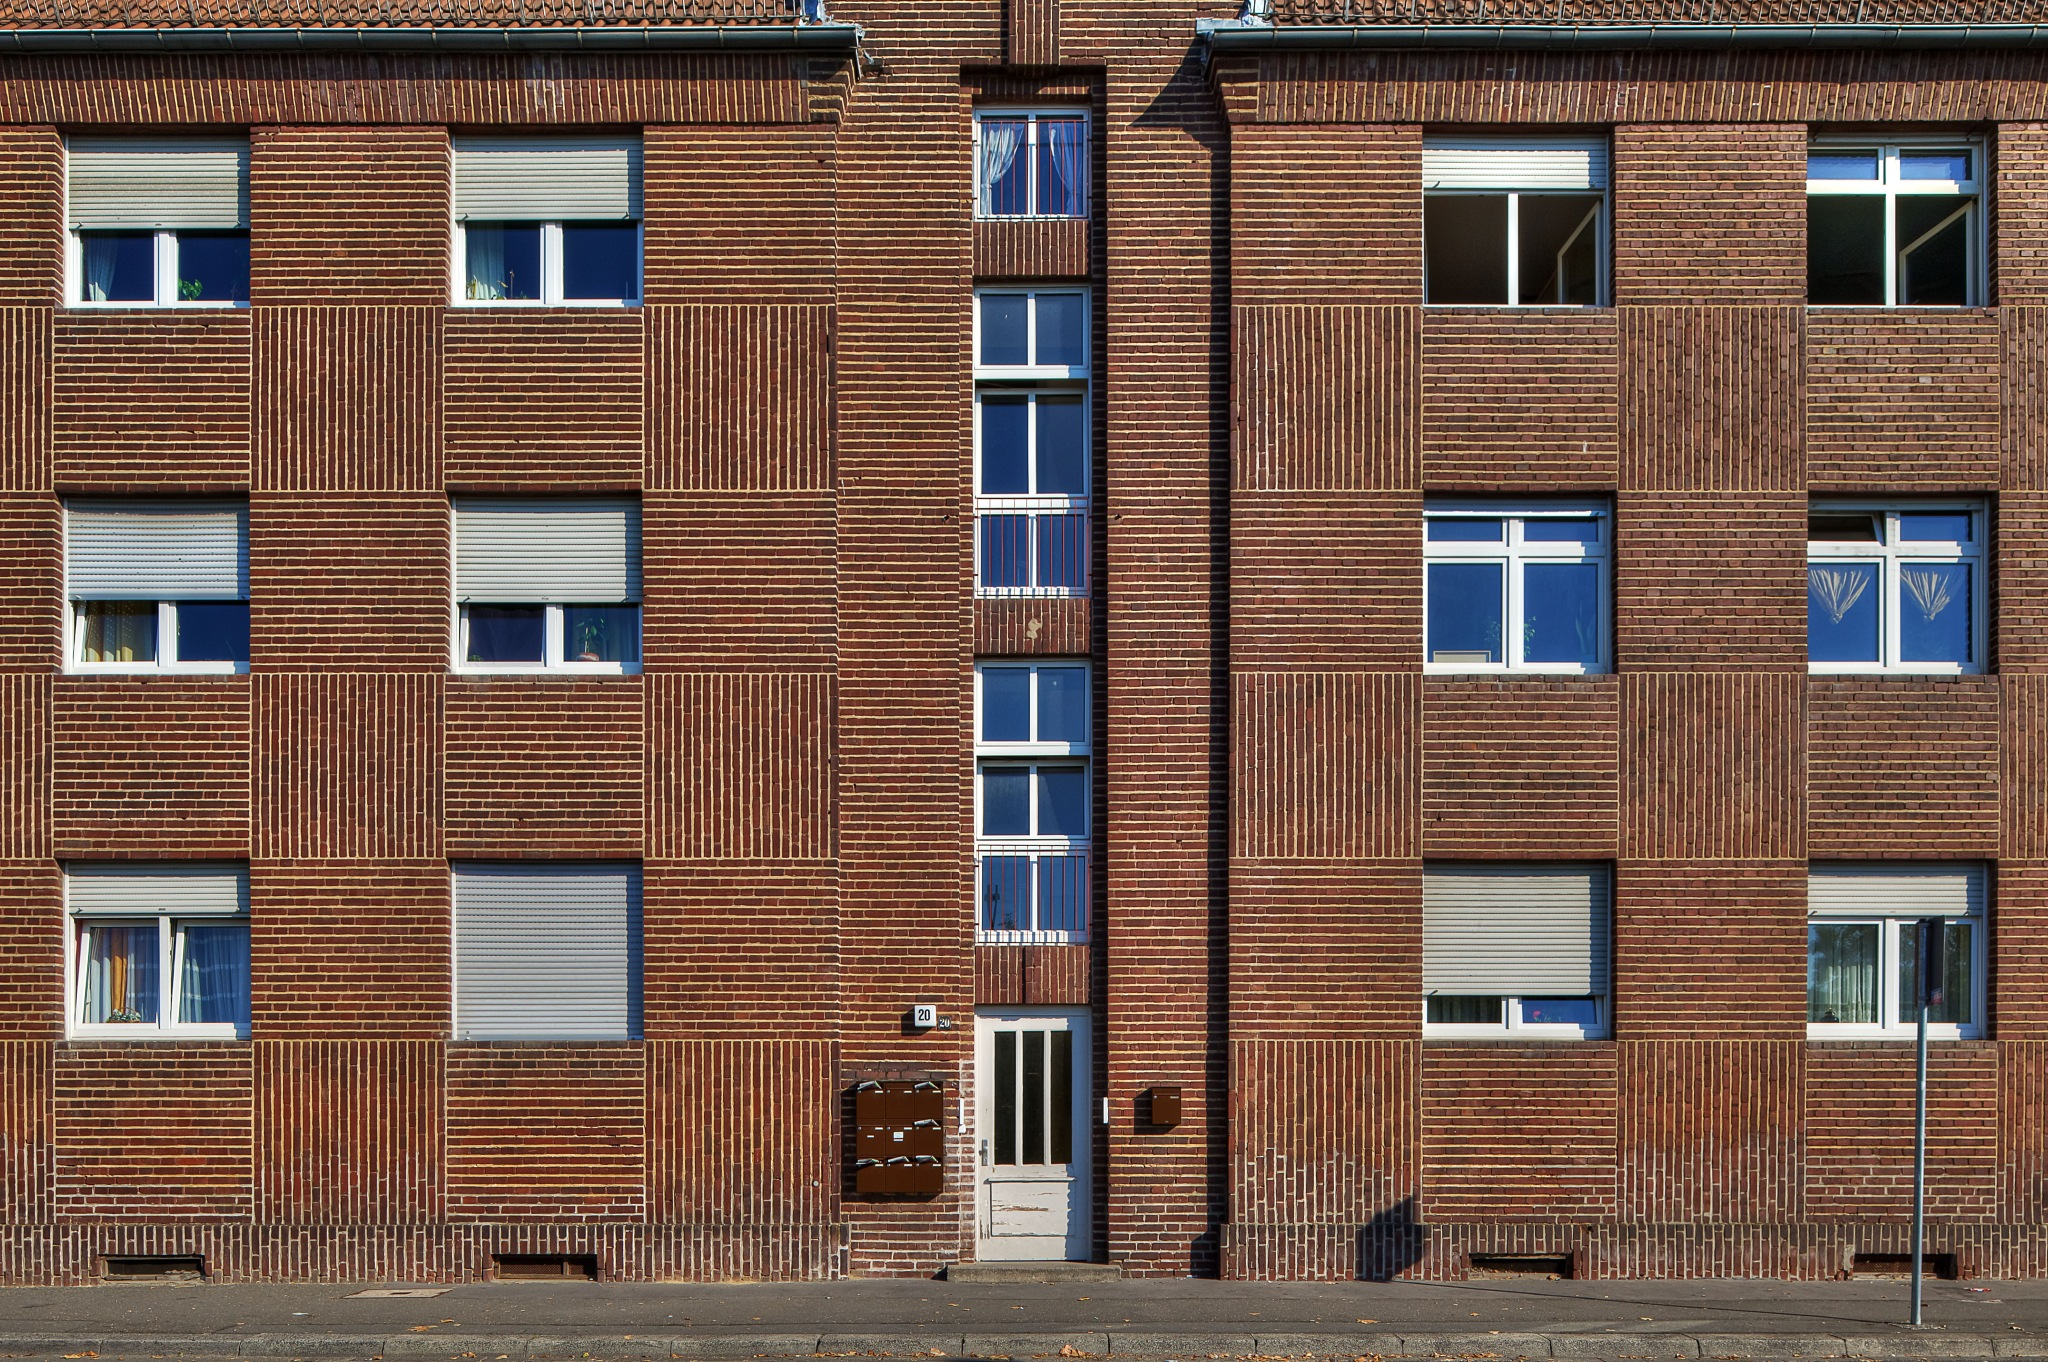 Clinker Brick Facade by Hartmut Ustorf